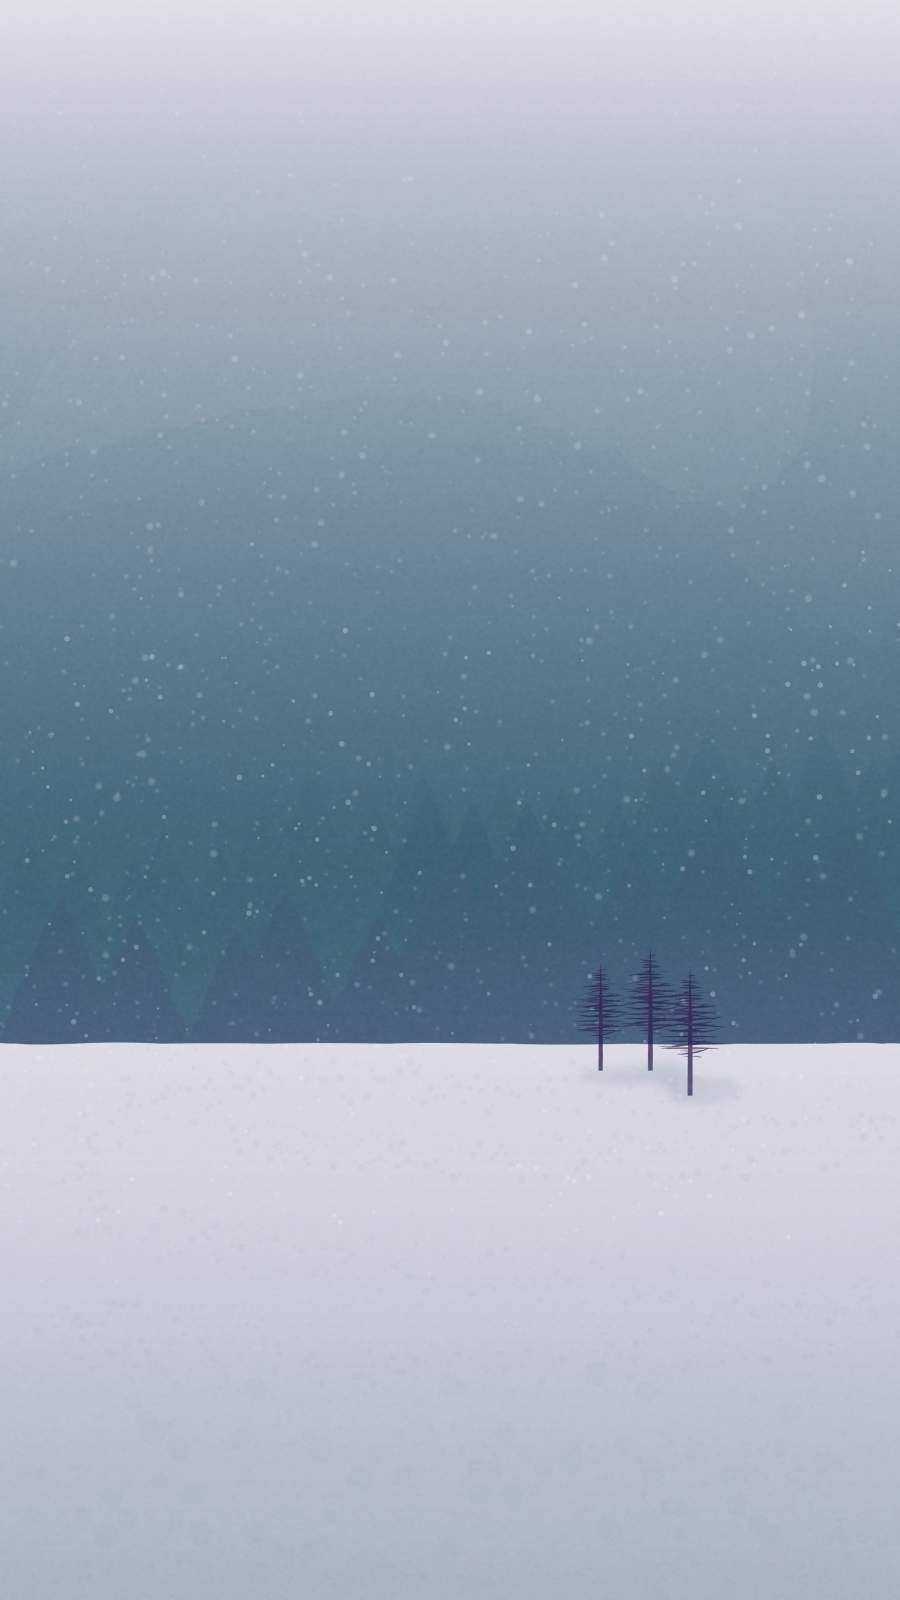 Snow Minimal iPhone Wallpaper